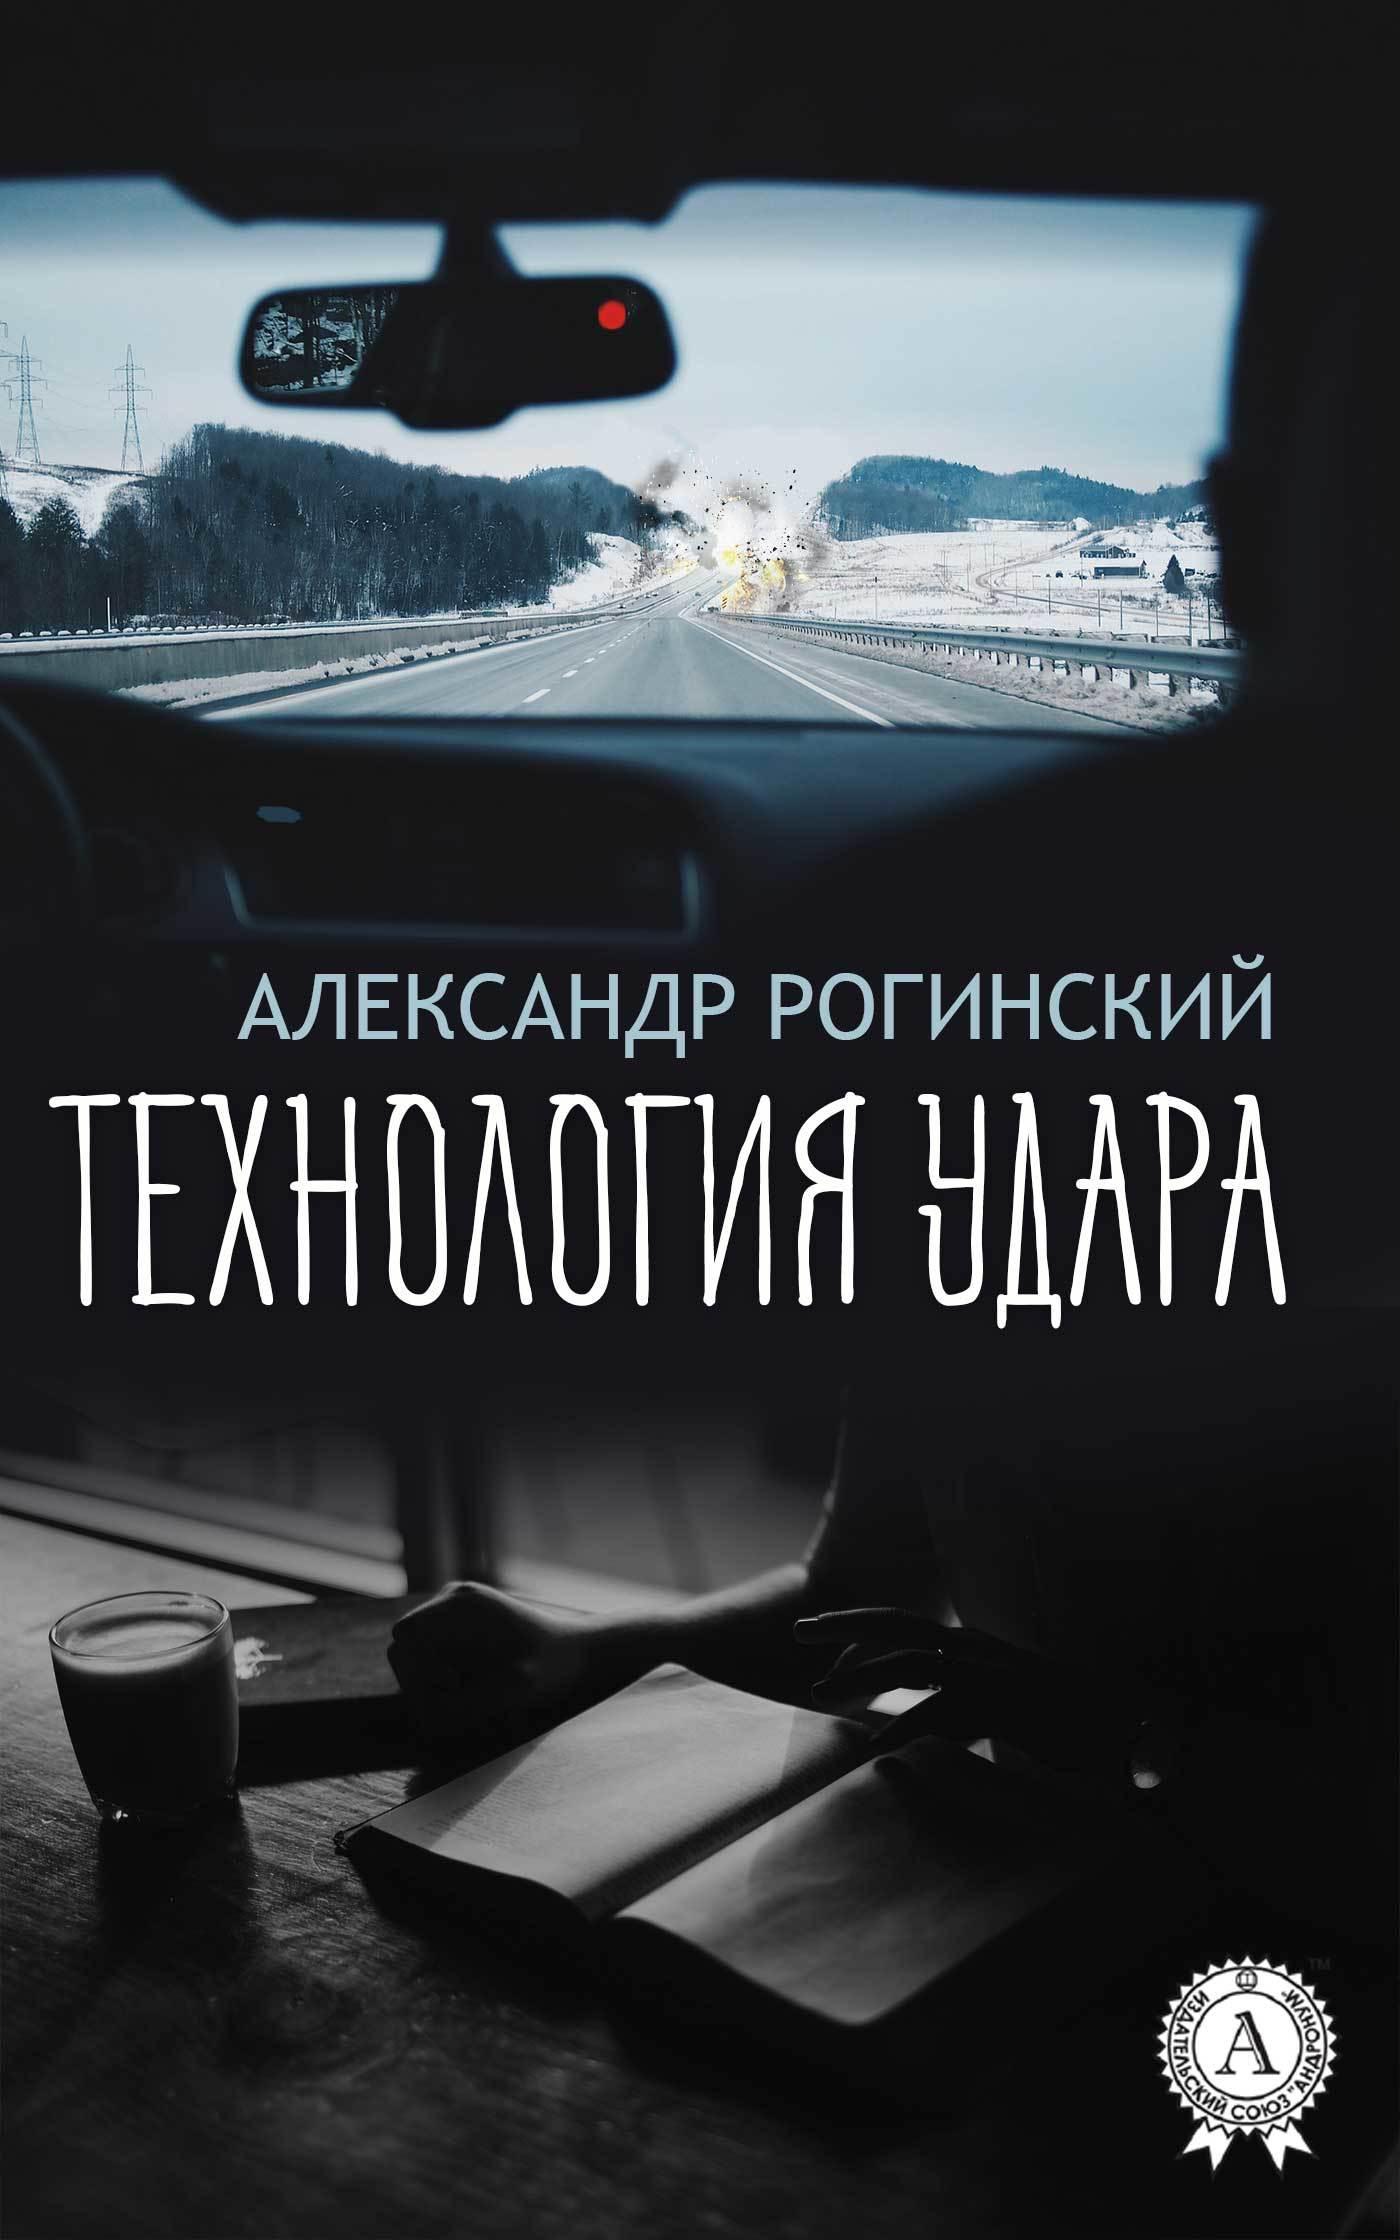 Александр Рогинский - Технология удара